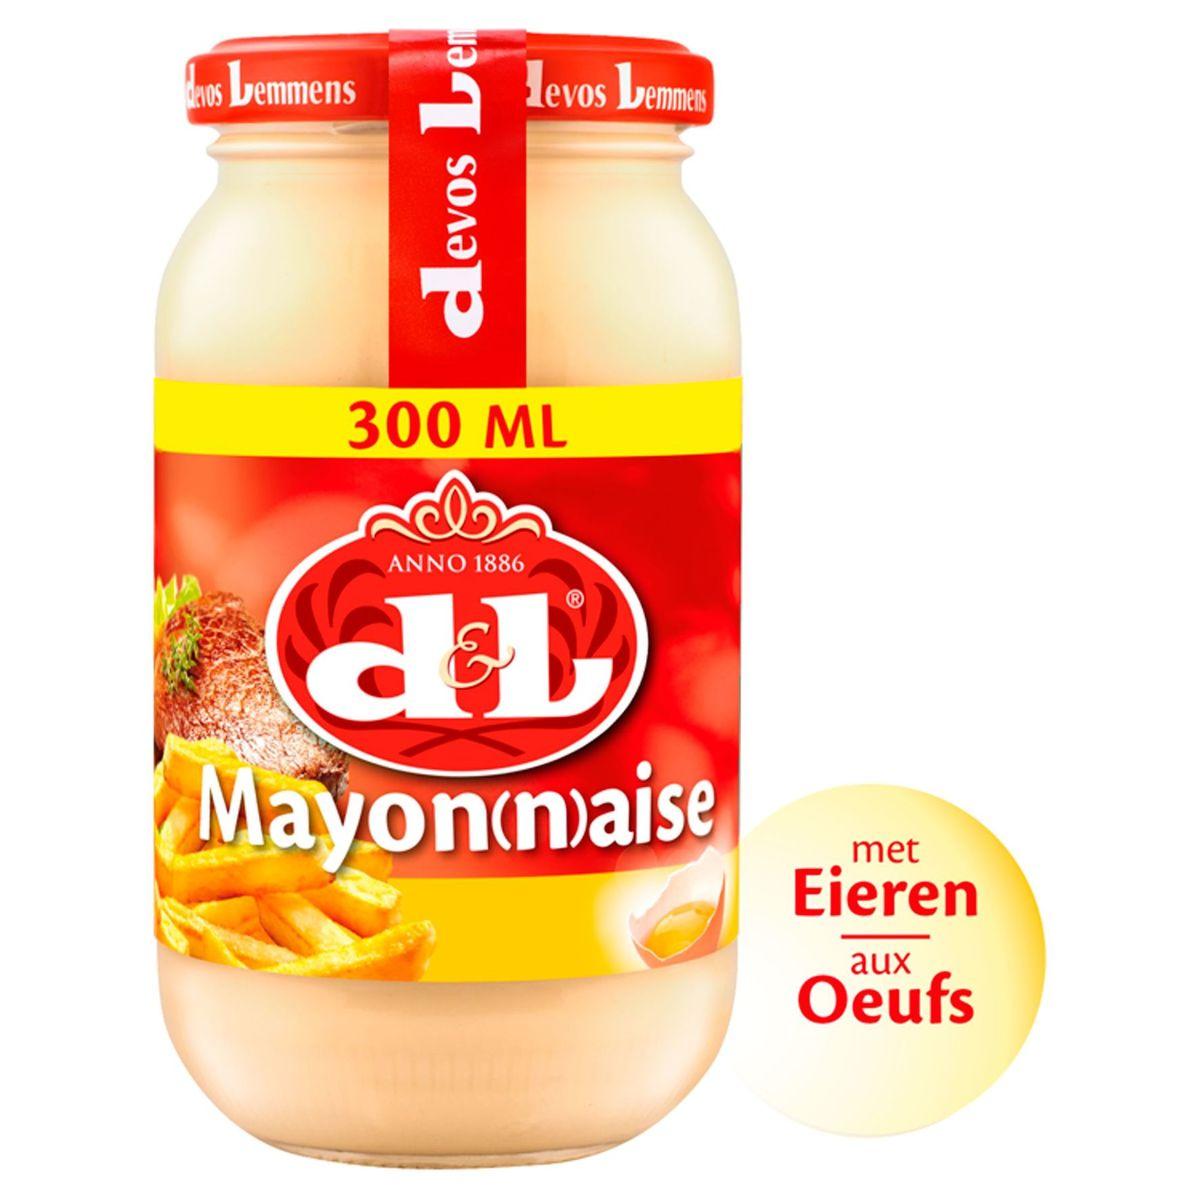 Devos Lemmens Mayonaise met Ei 300 ml